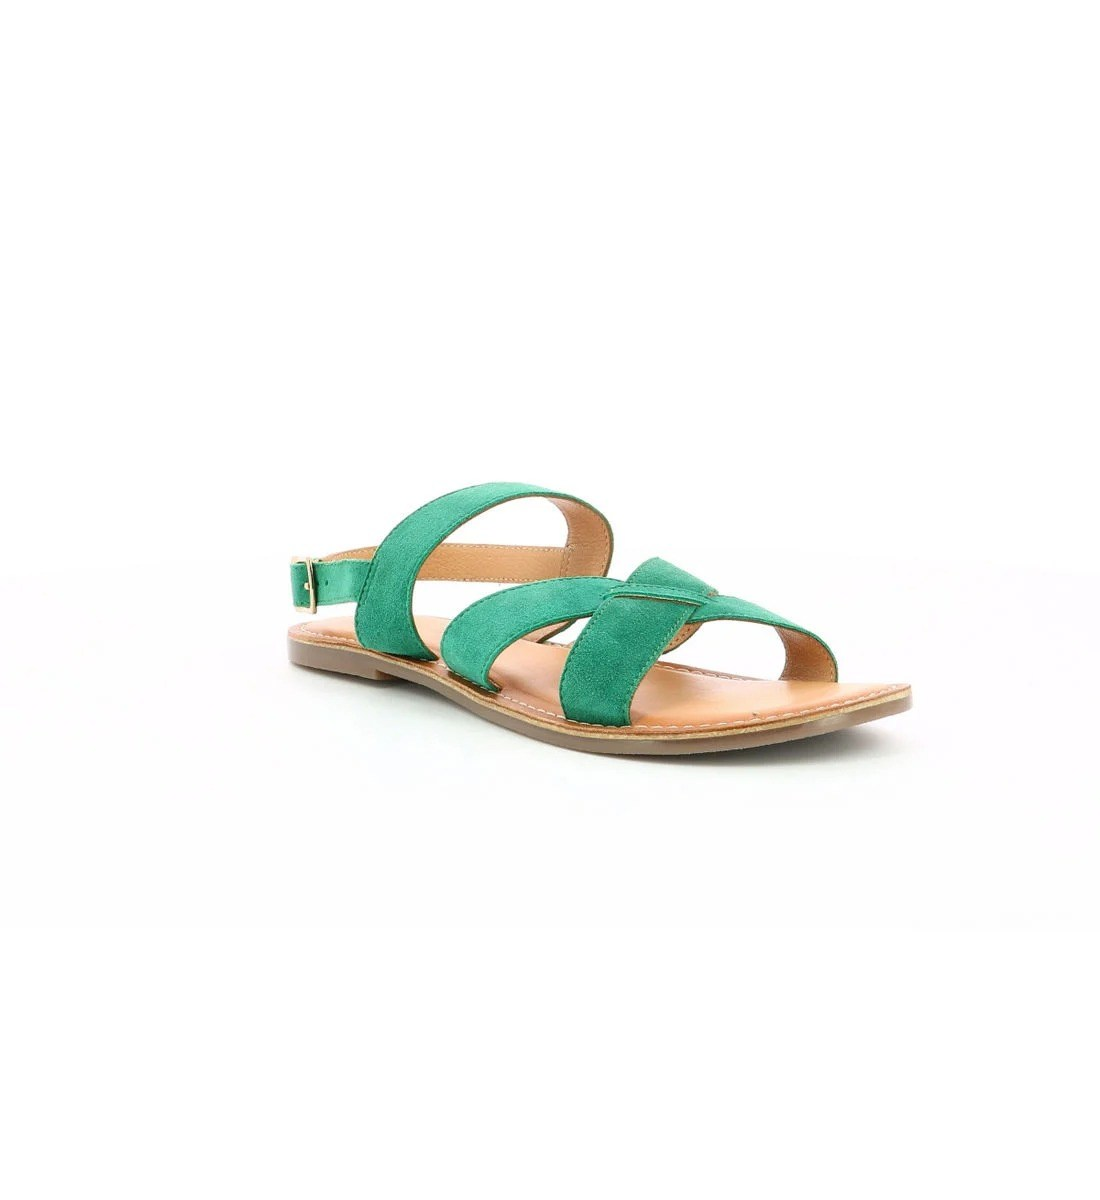 Sandales en cuir, Kickers, 33€ au lieu de 55€.